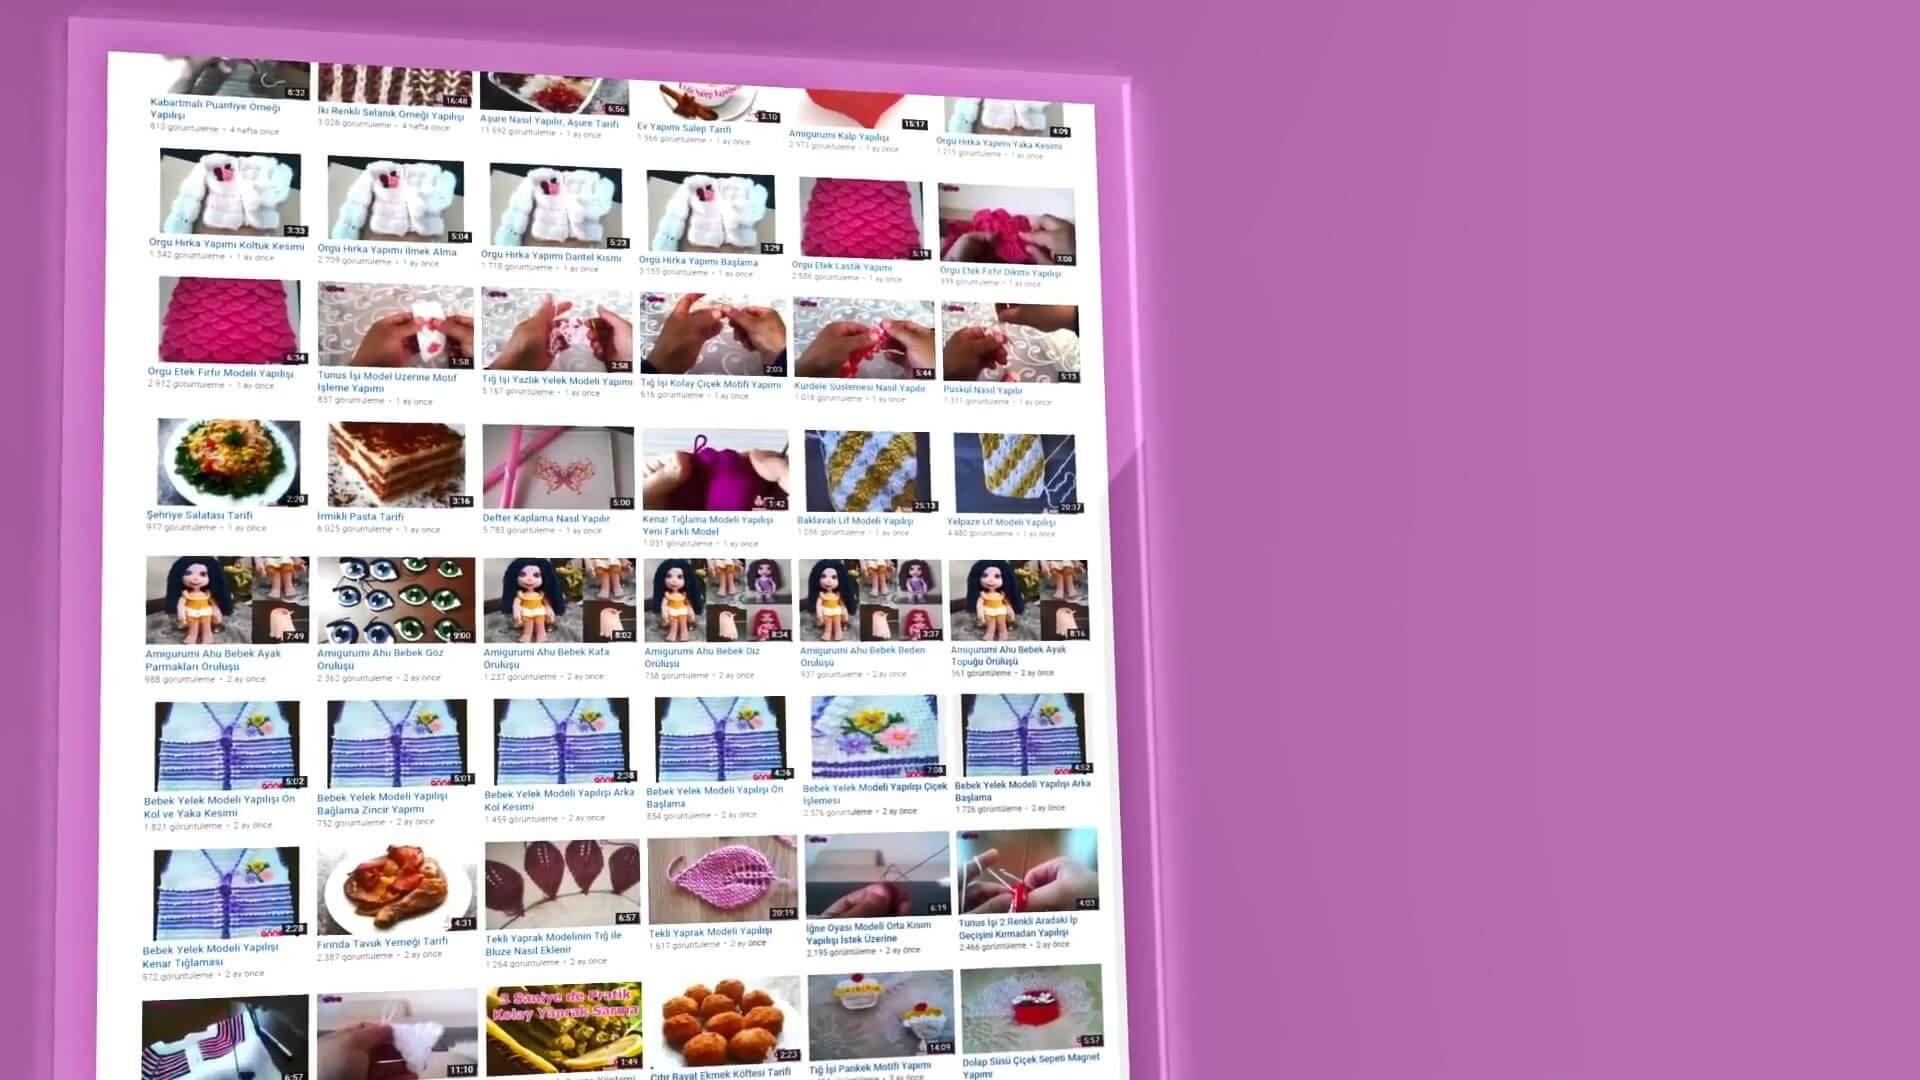 Canımanne4 1920x1080 - Canimanne.com Animasyon Filmi